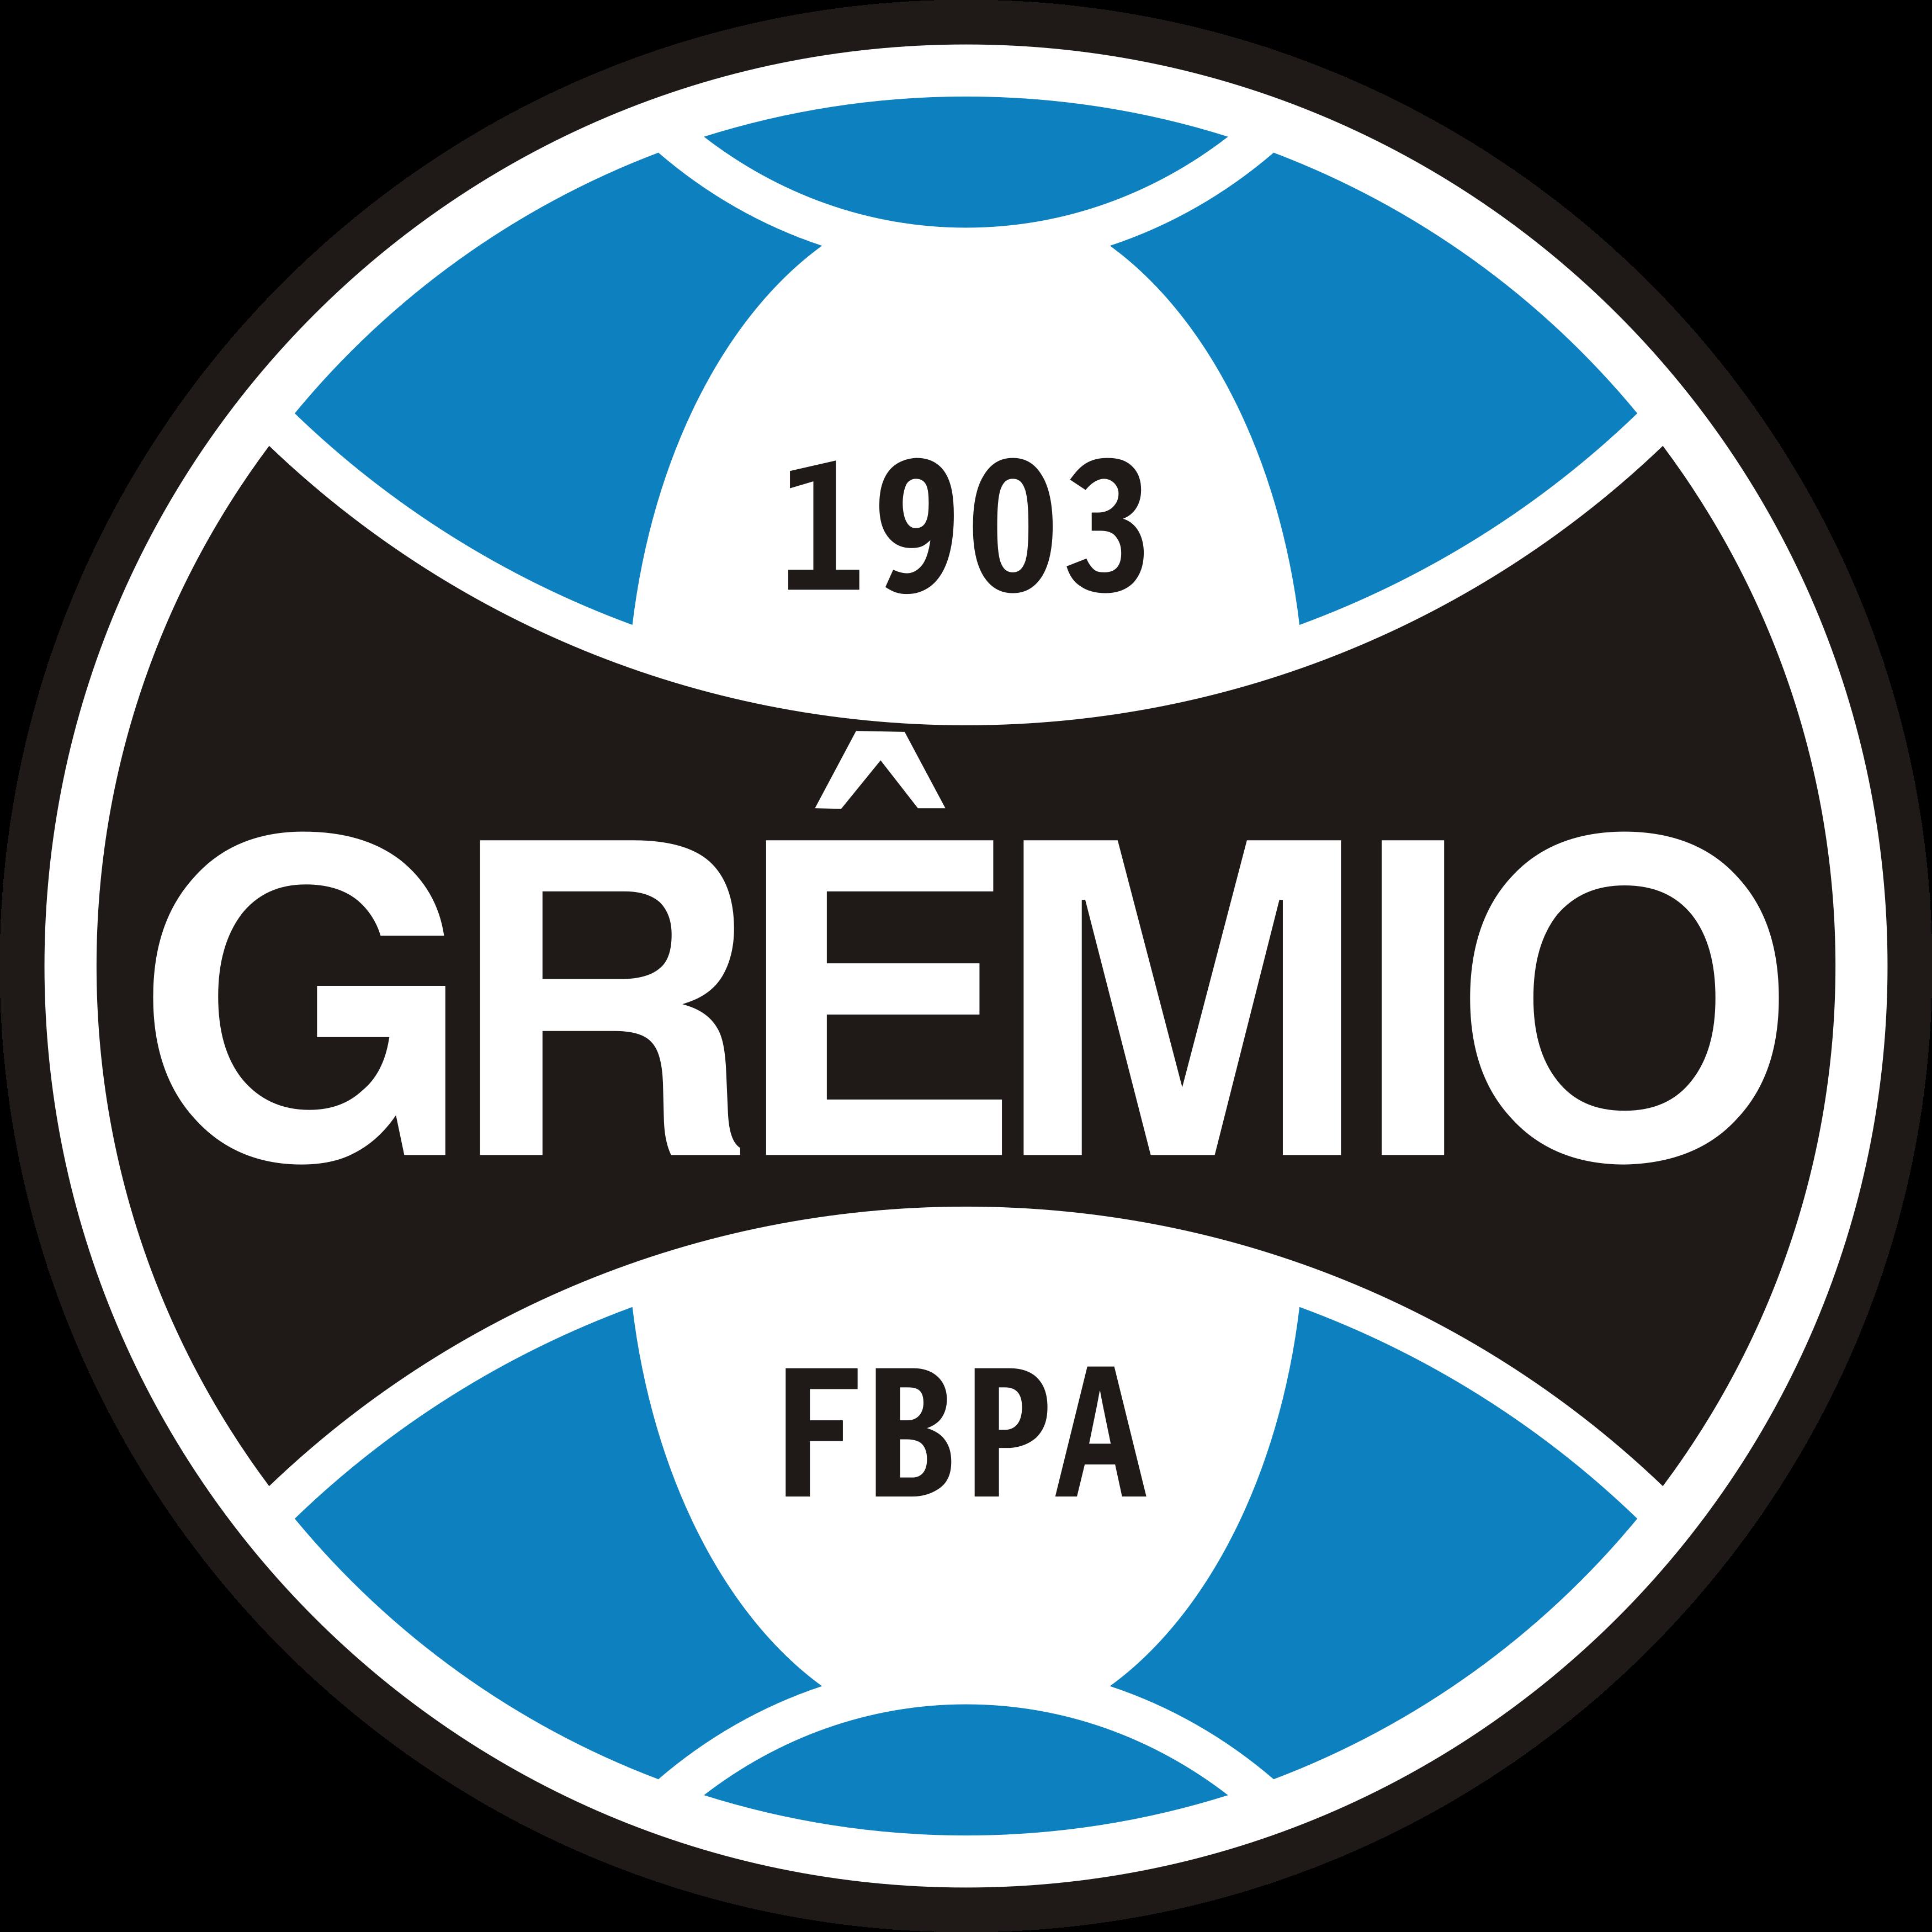 gremio logo escudo - Grêmio Logo - Grêmio Escudo